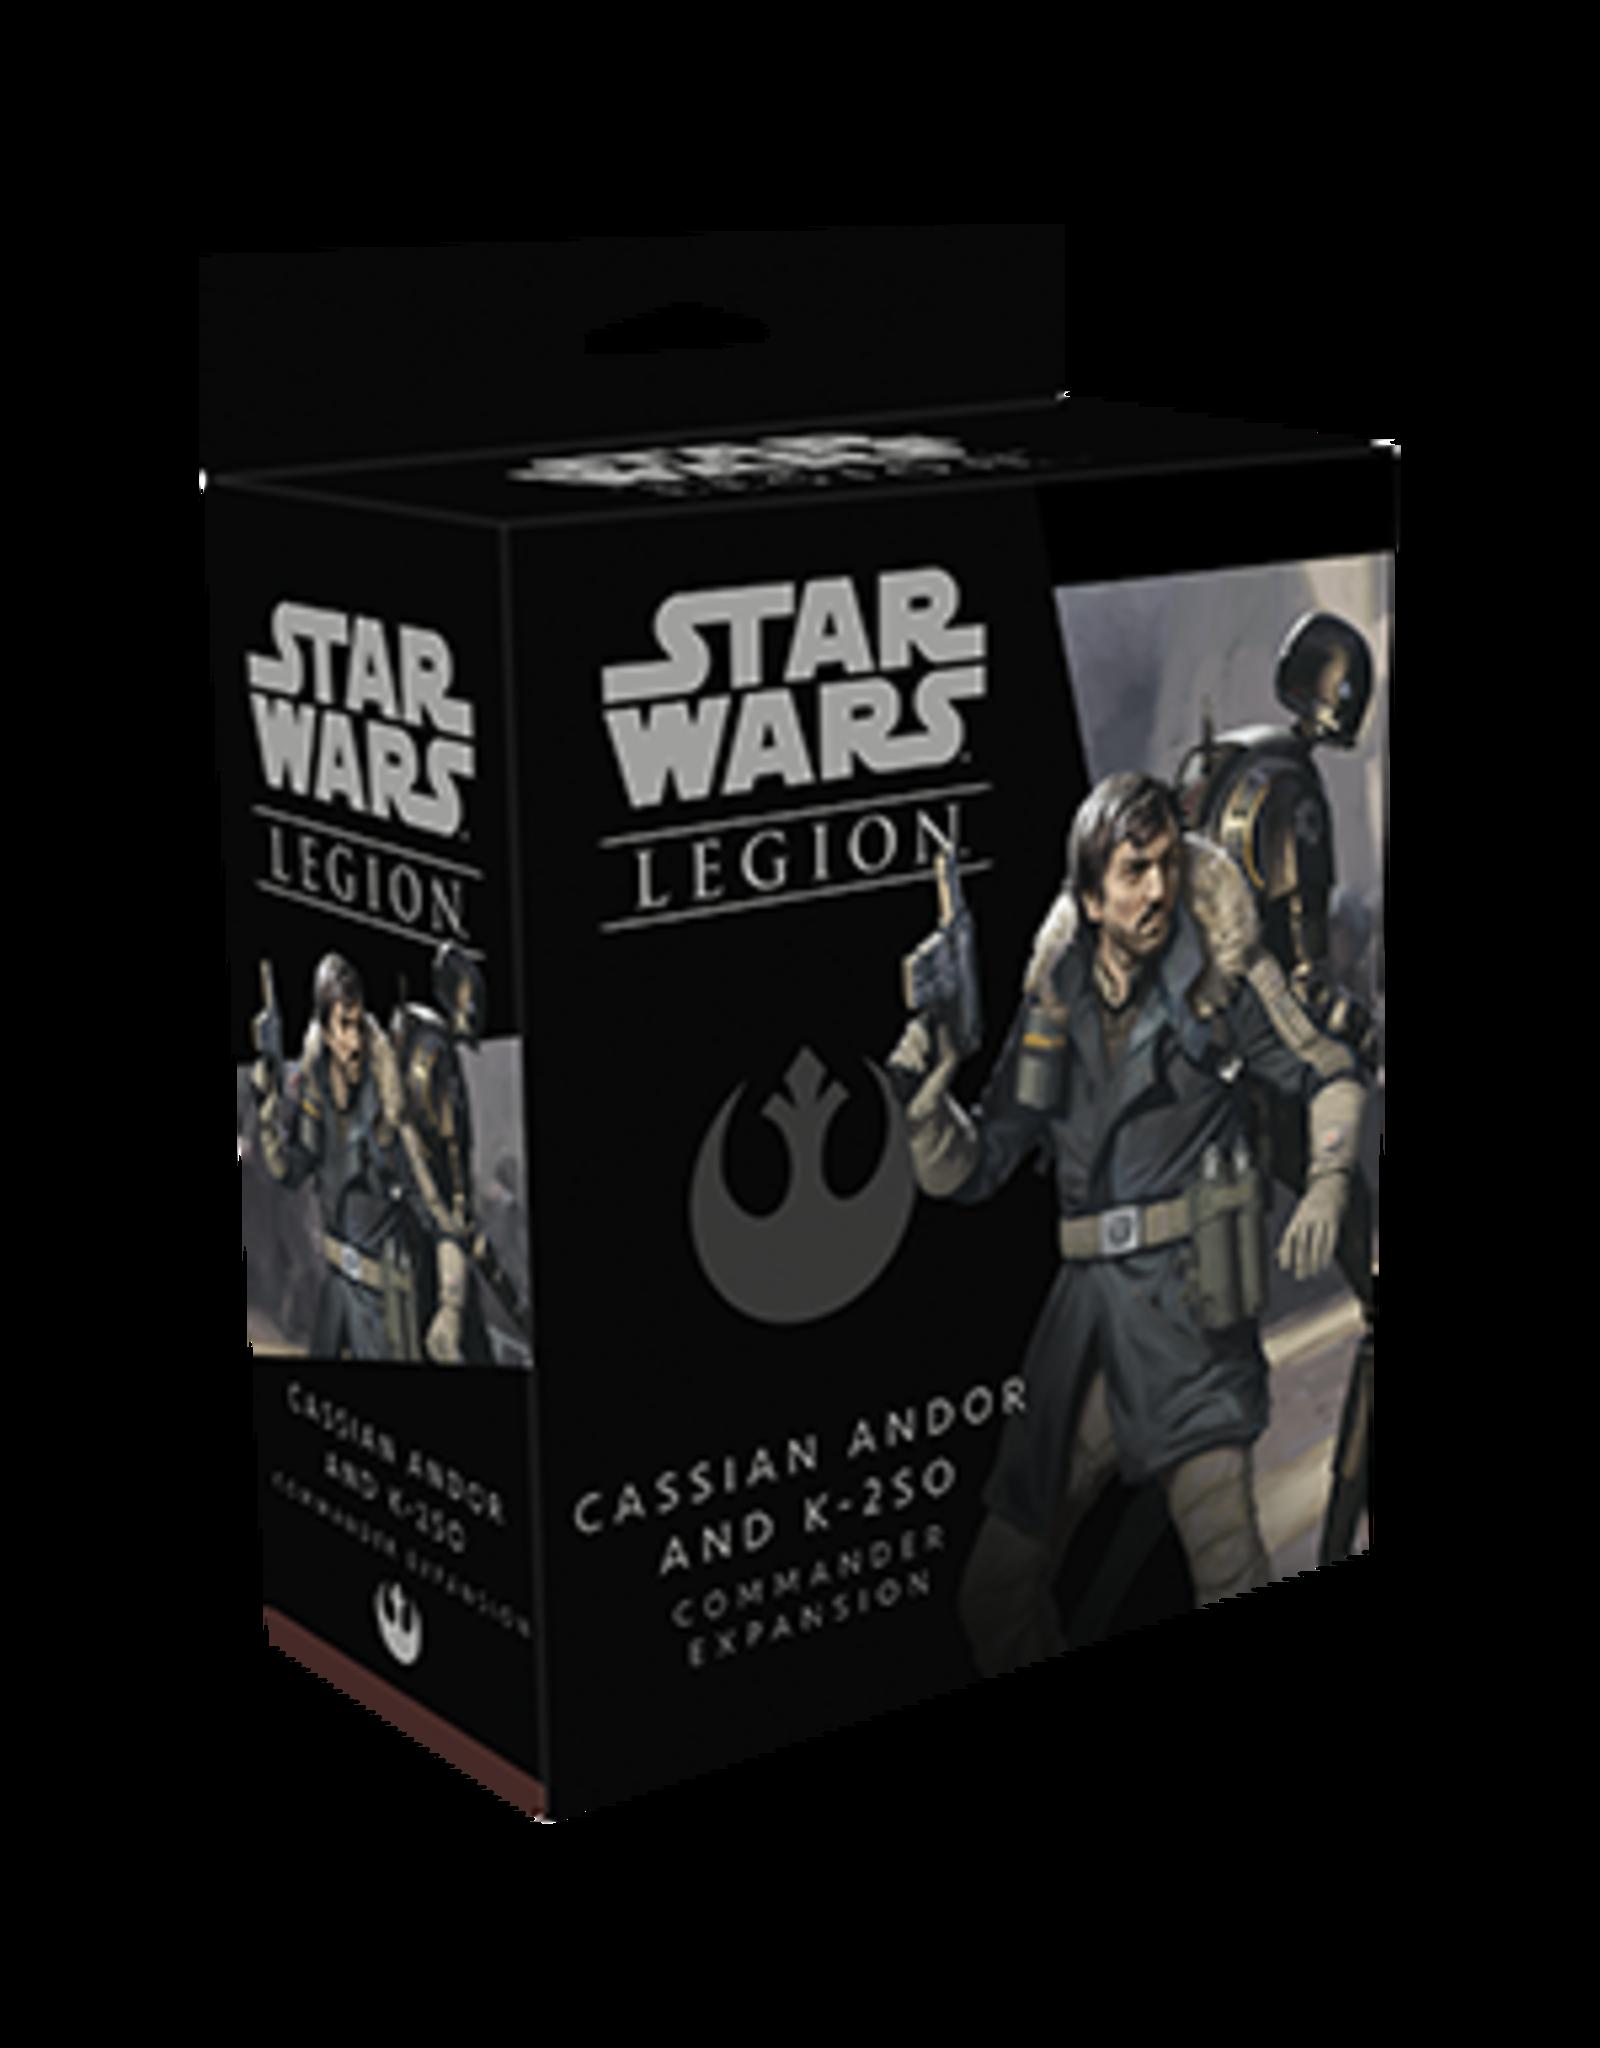 Star Wars: Legion - Cassian Andor and K-2SO Commander Expansion